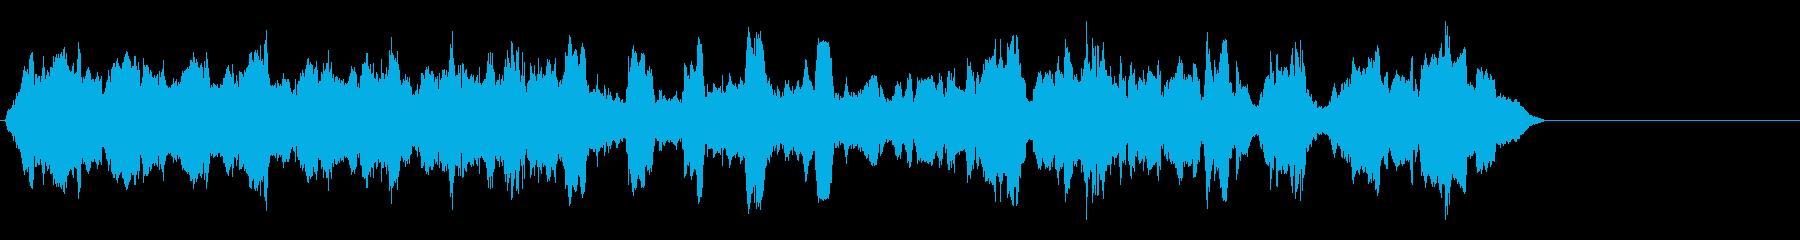 HURDY GURDY:高速、高音...の再生済みの波形